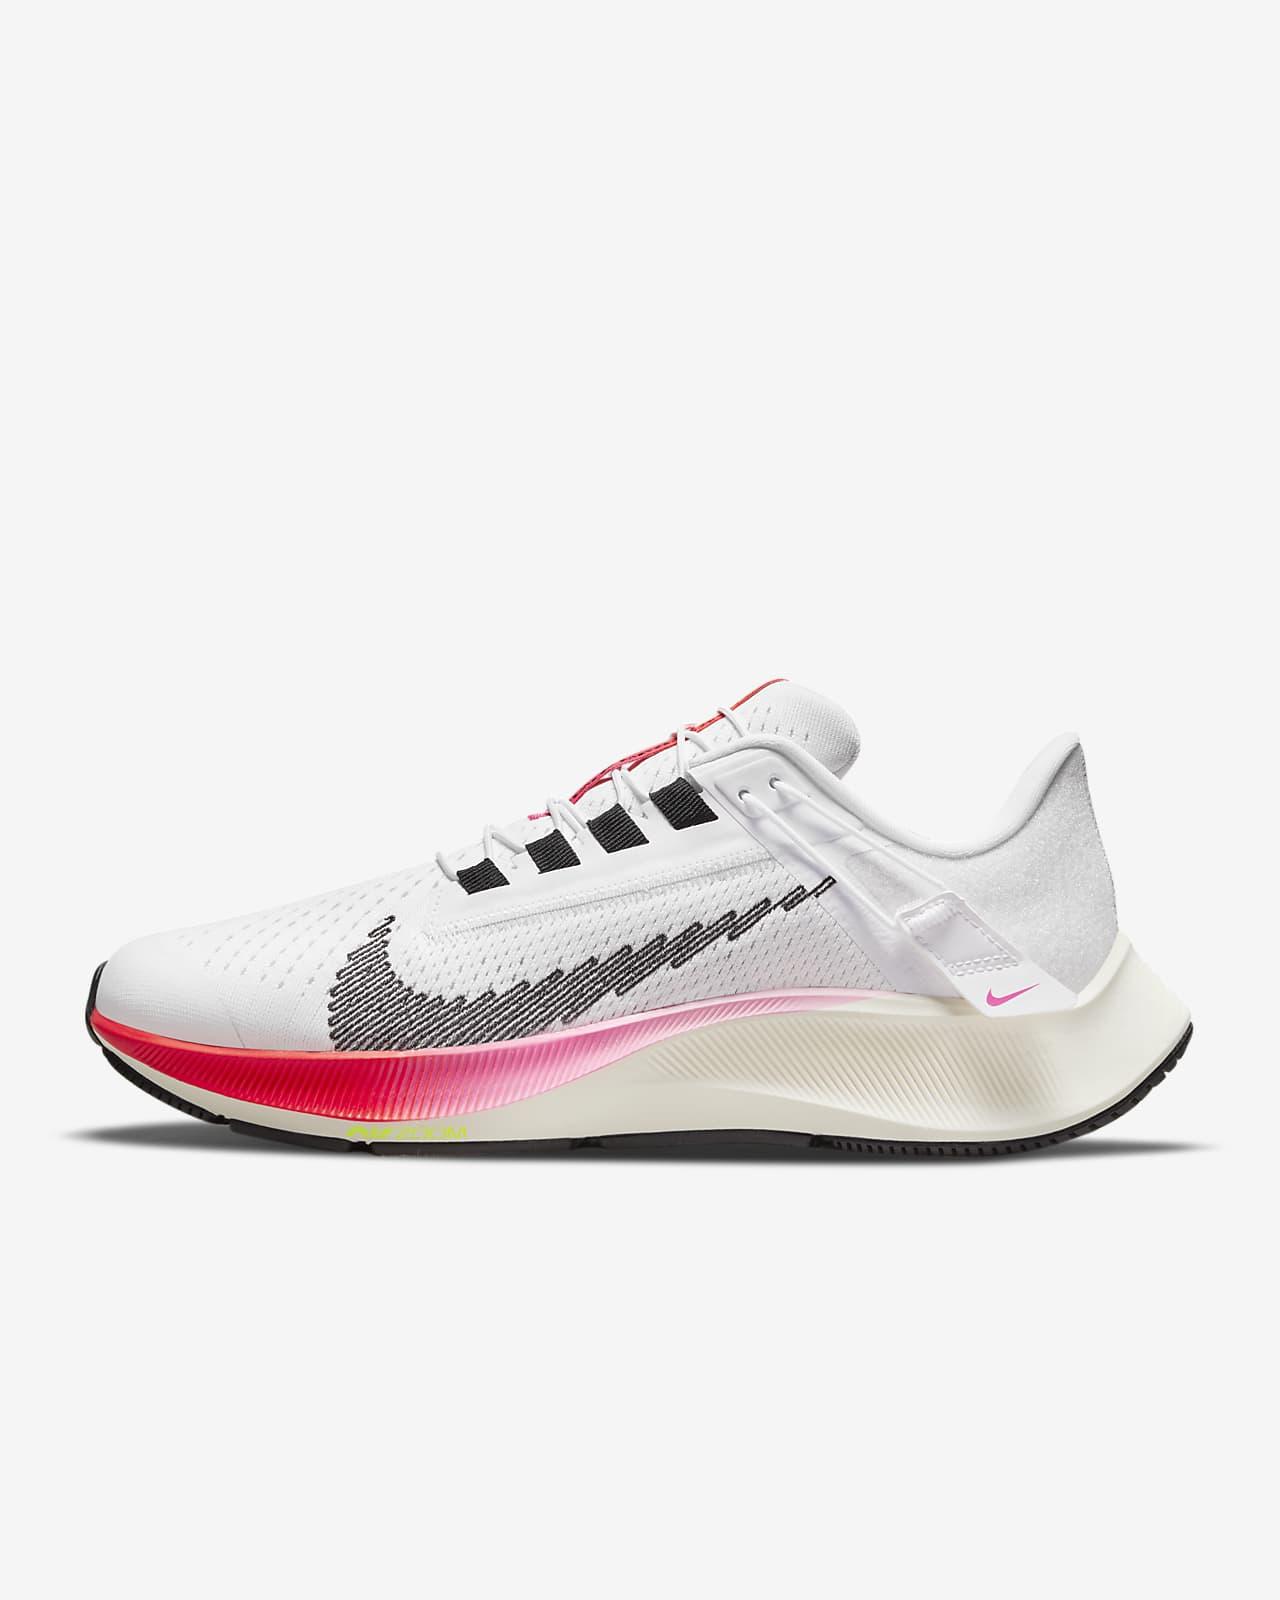 Chaussure de running sur route facile à enfiler Nike Air Zoom ...